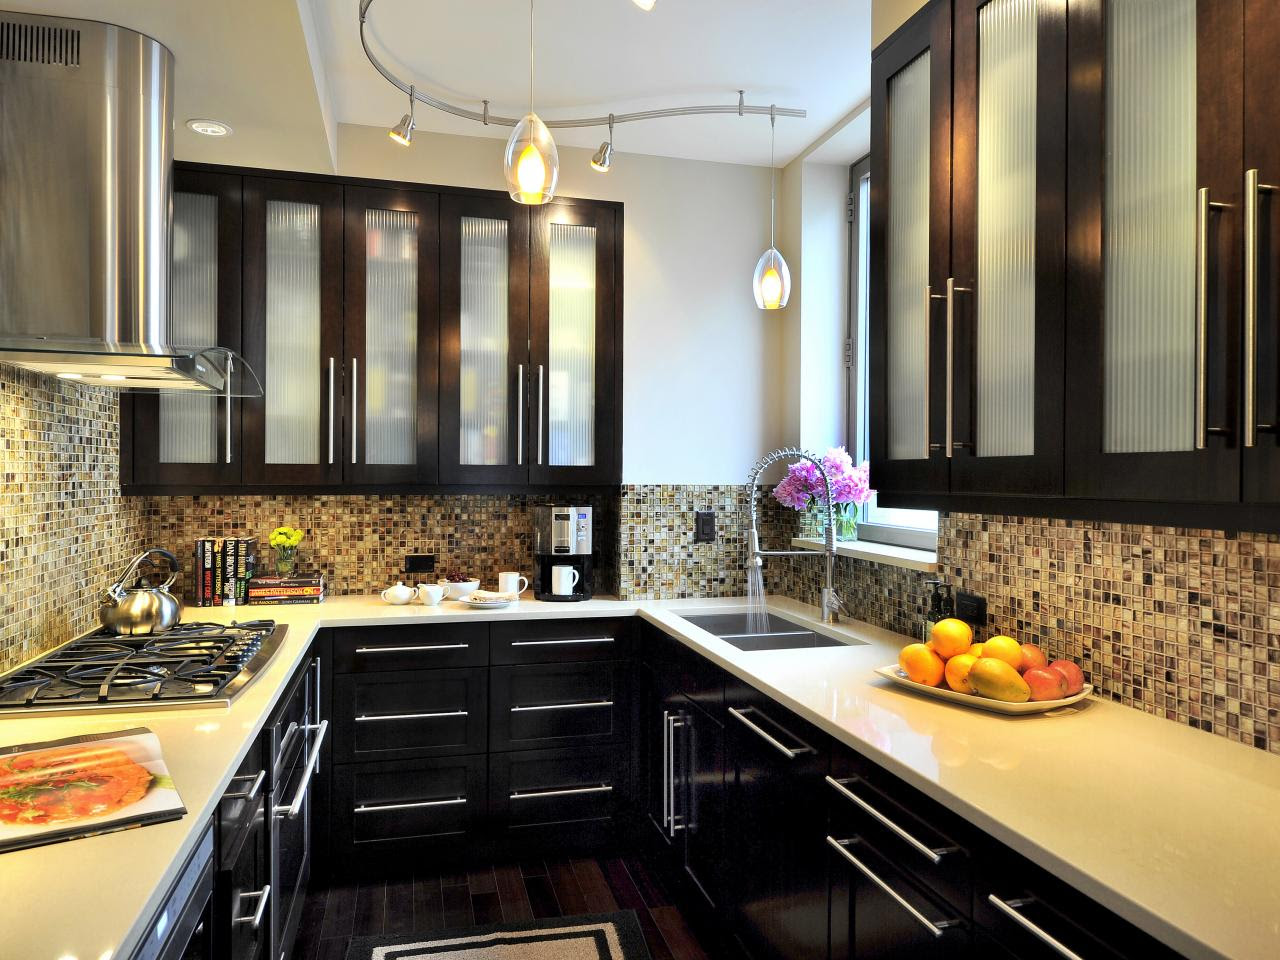 Plan a Small-Space Kitchen | HGTV